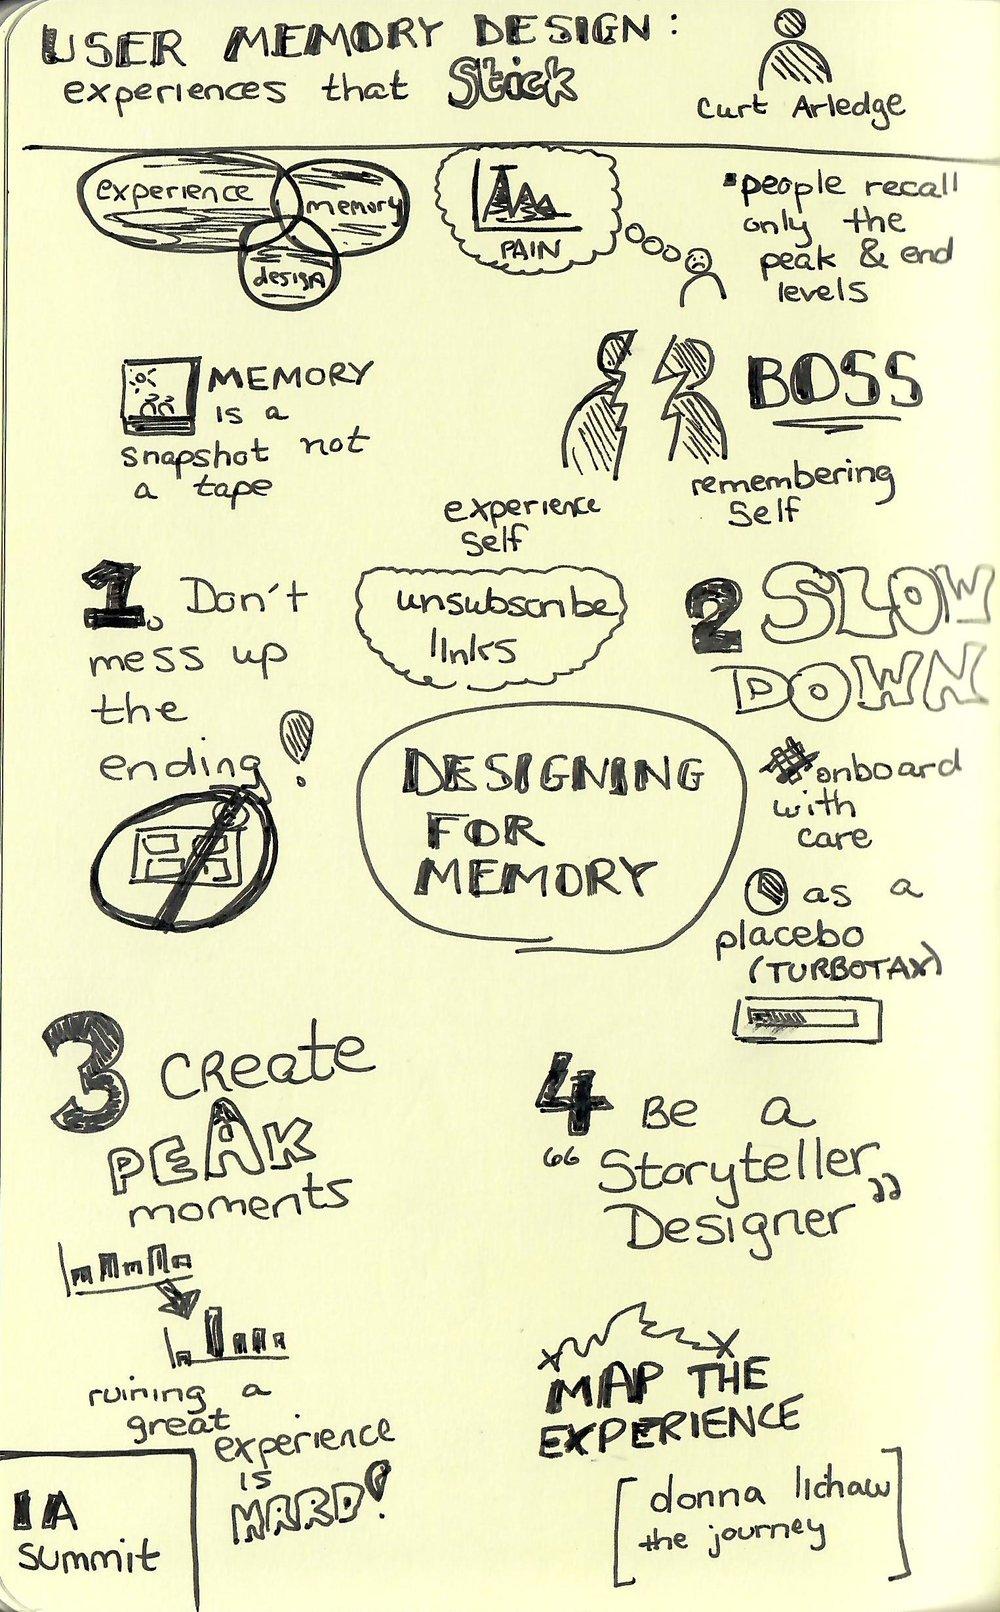 User Memory Design (Curtis Arledge).jpg